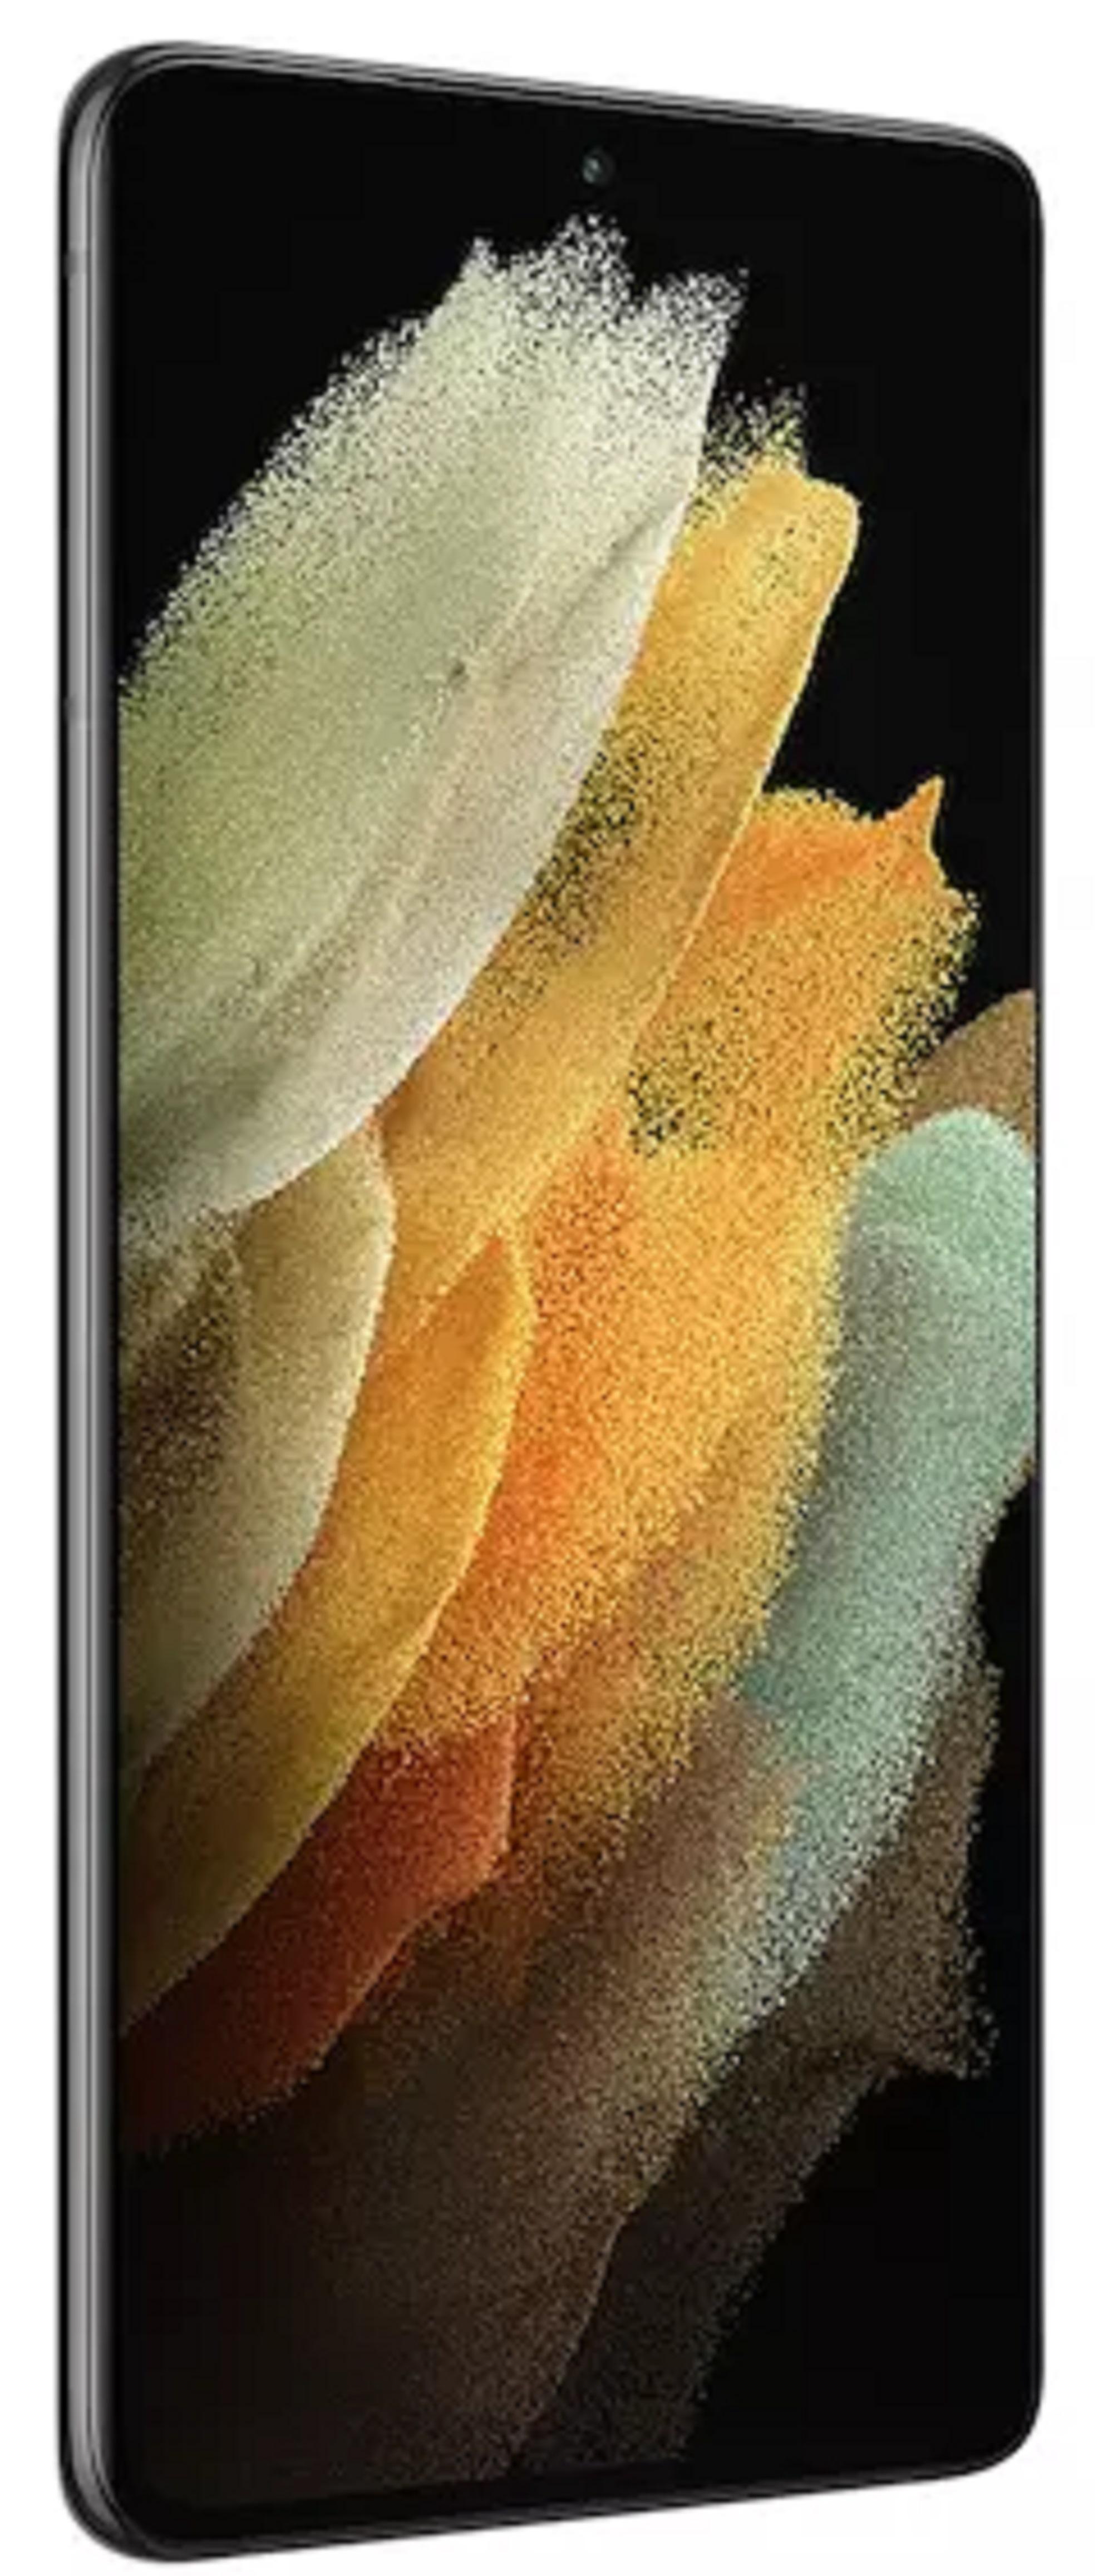 thumbnail 17 - Samsung Galaxy G998U S21 Ultra 5G 128GB Unlocked Smartphone - Excellent